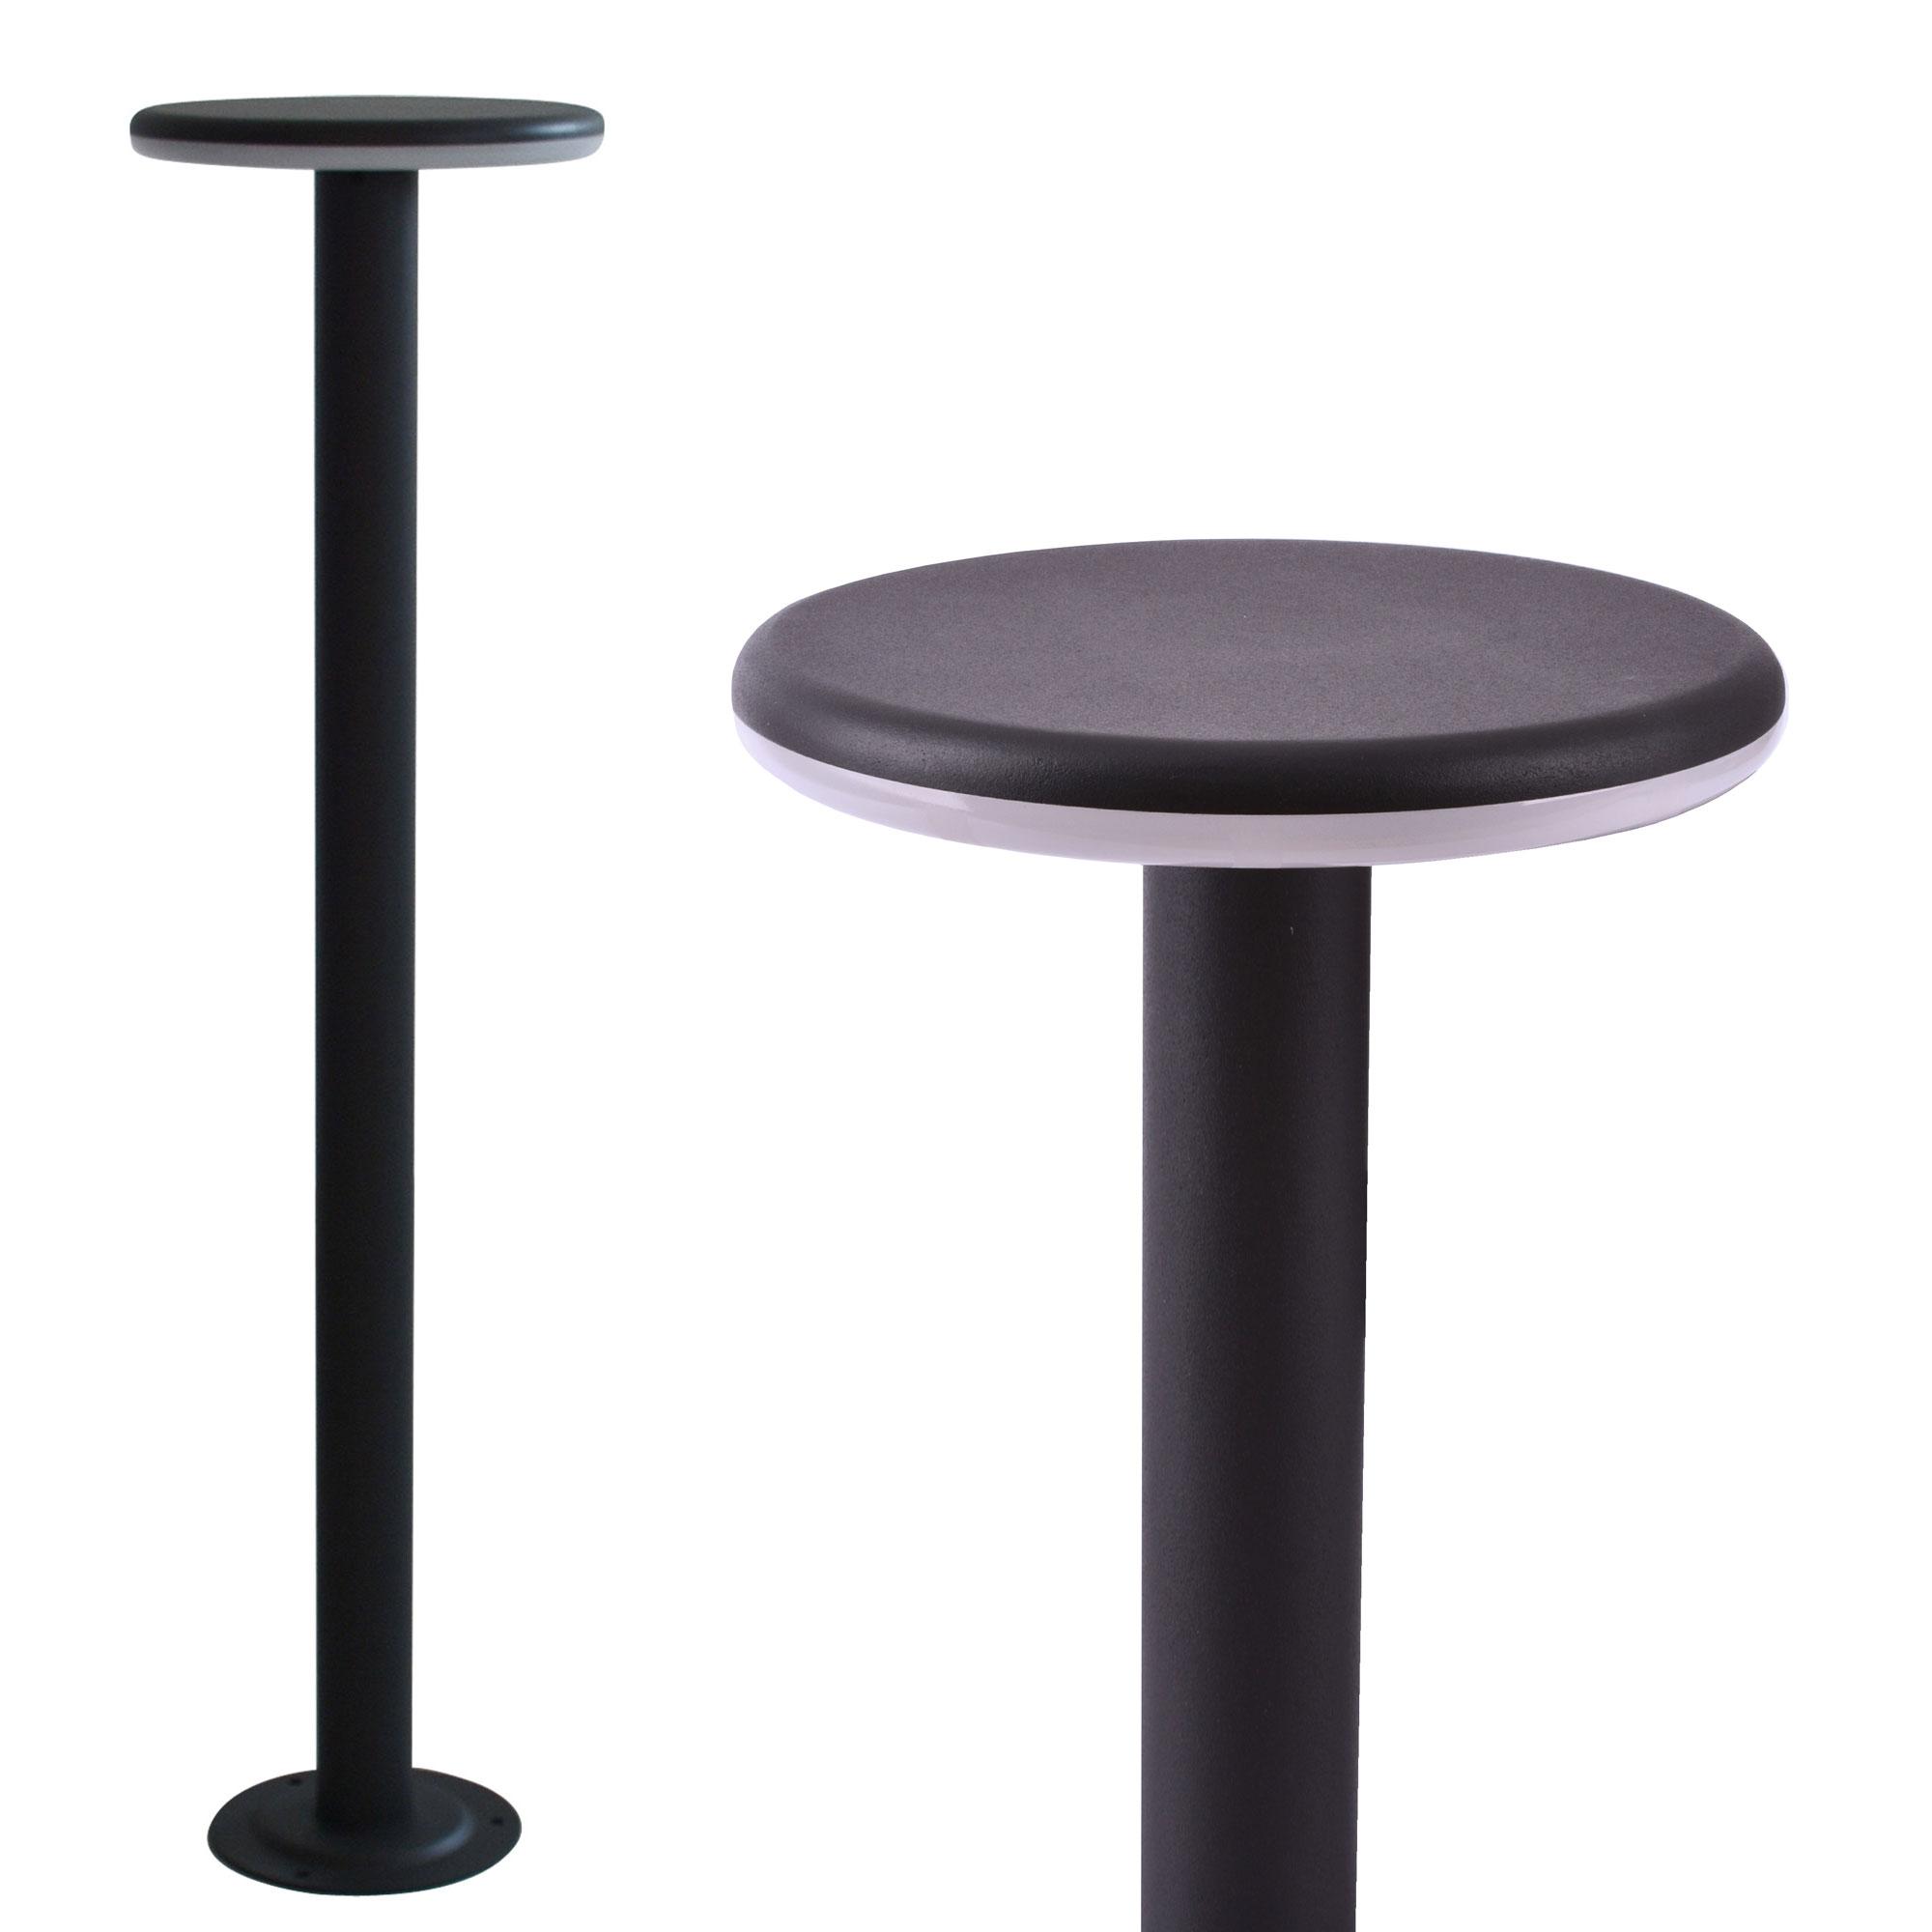 led 10w au enwandleuchte au enleuchte standleuchte wandleuchte gartenlampe 17901 ebay. Black Bedroom Furniture Sets. Home Design Ideas